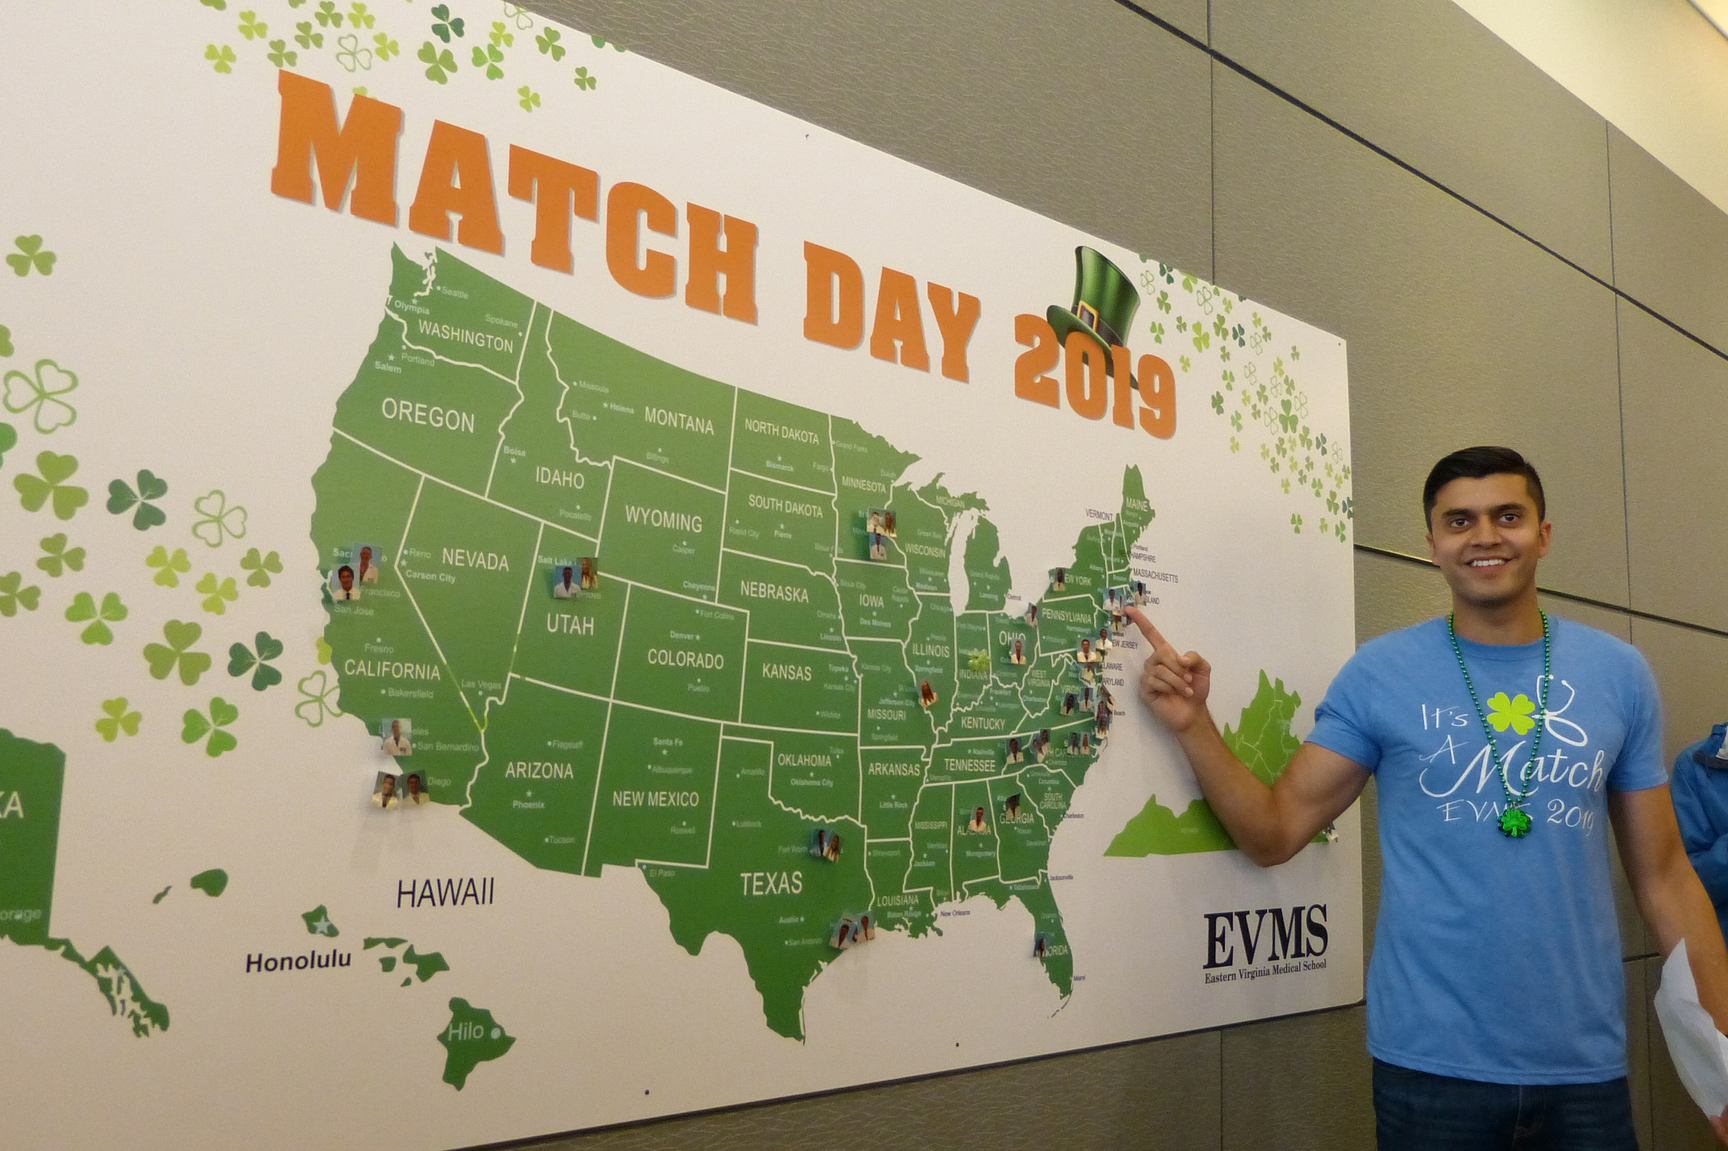 Match Day 2019 - Eastern Virginia Medical School (EVMS